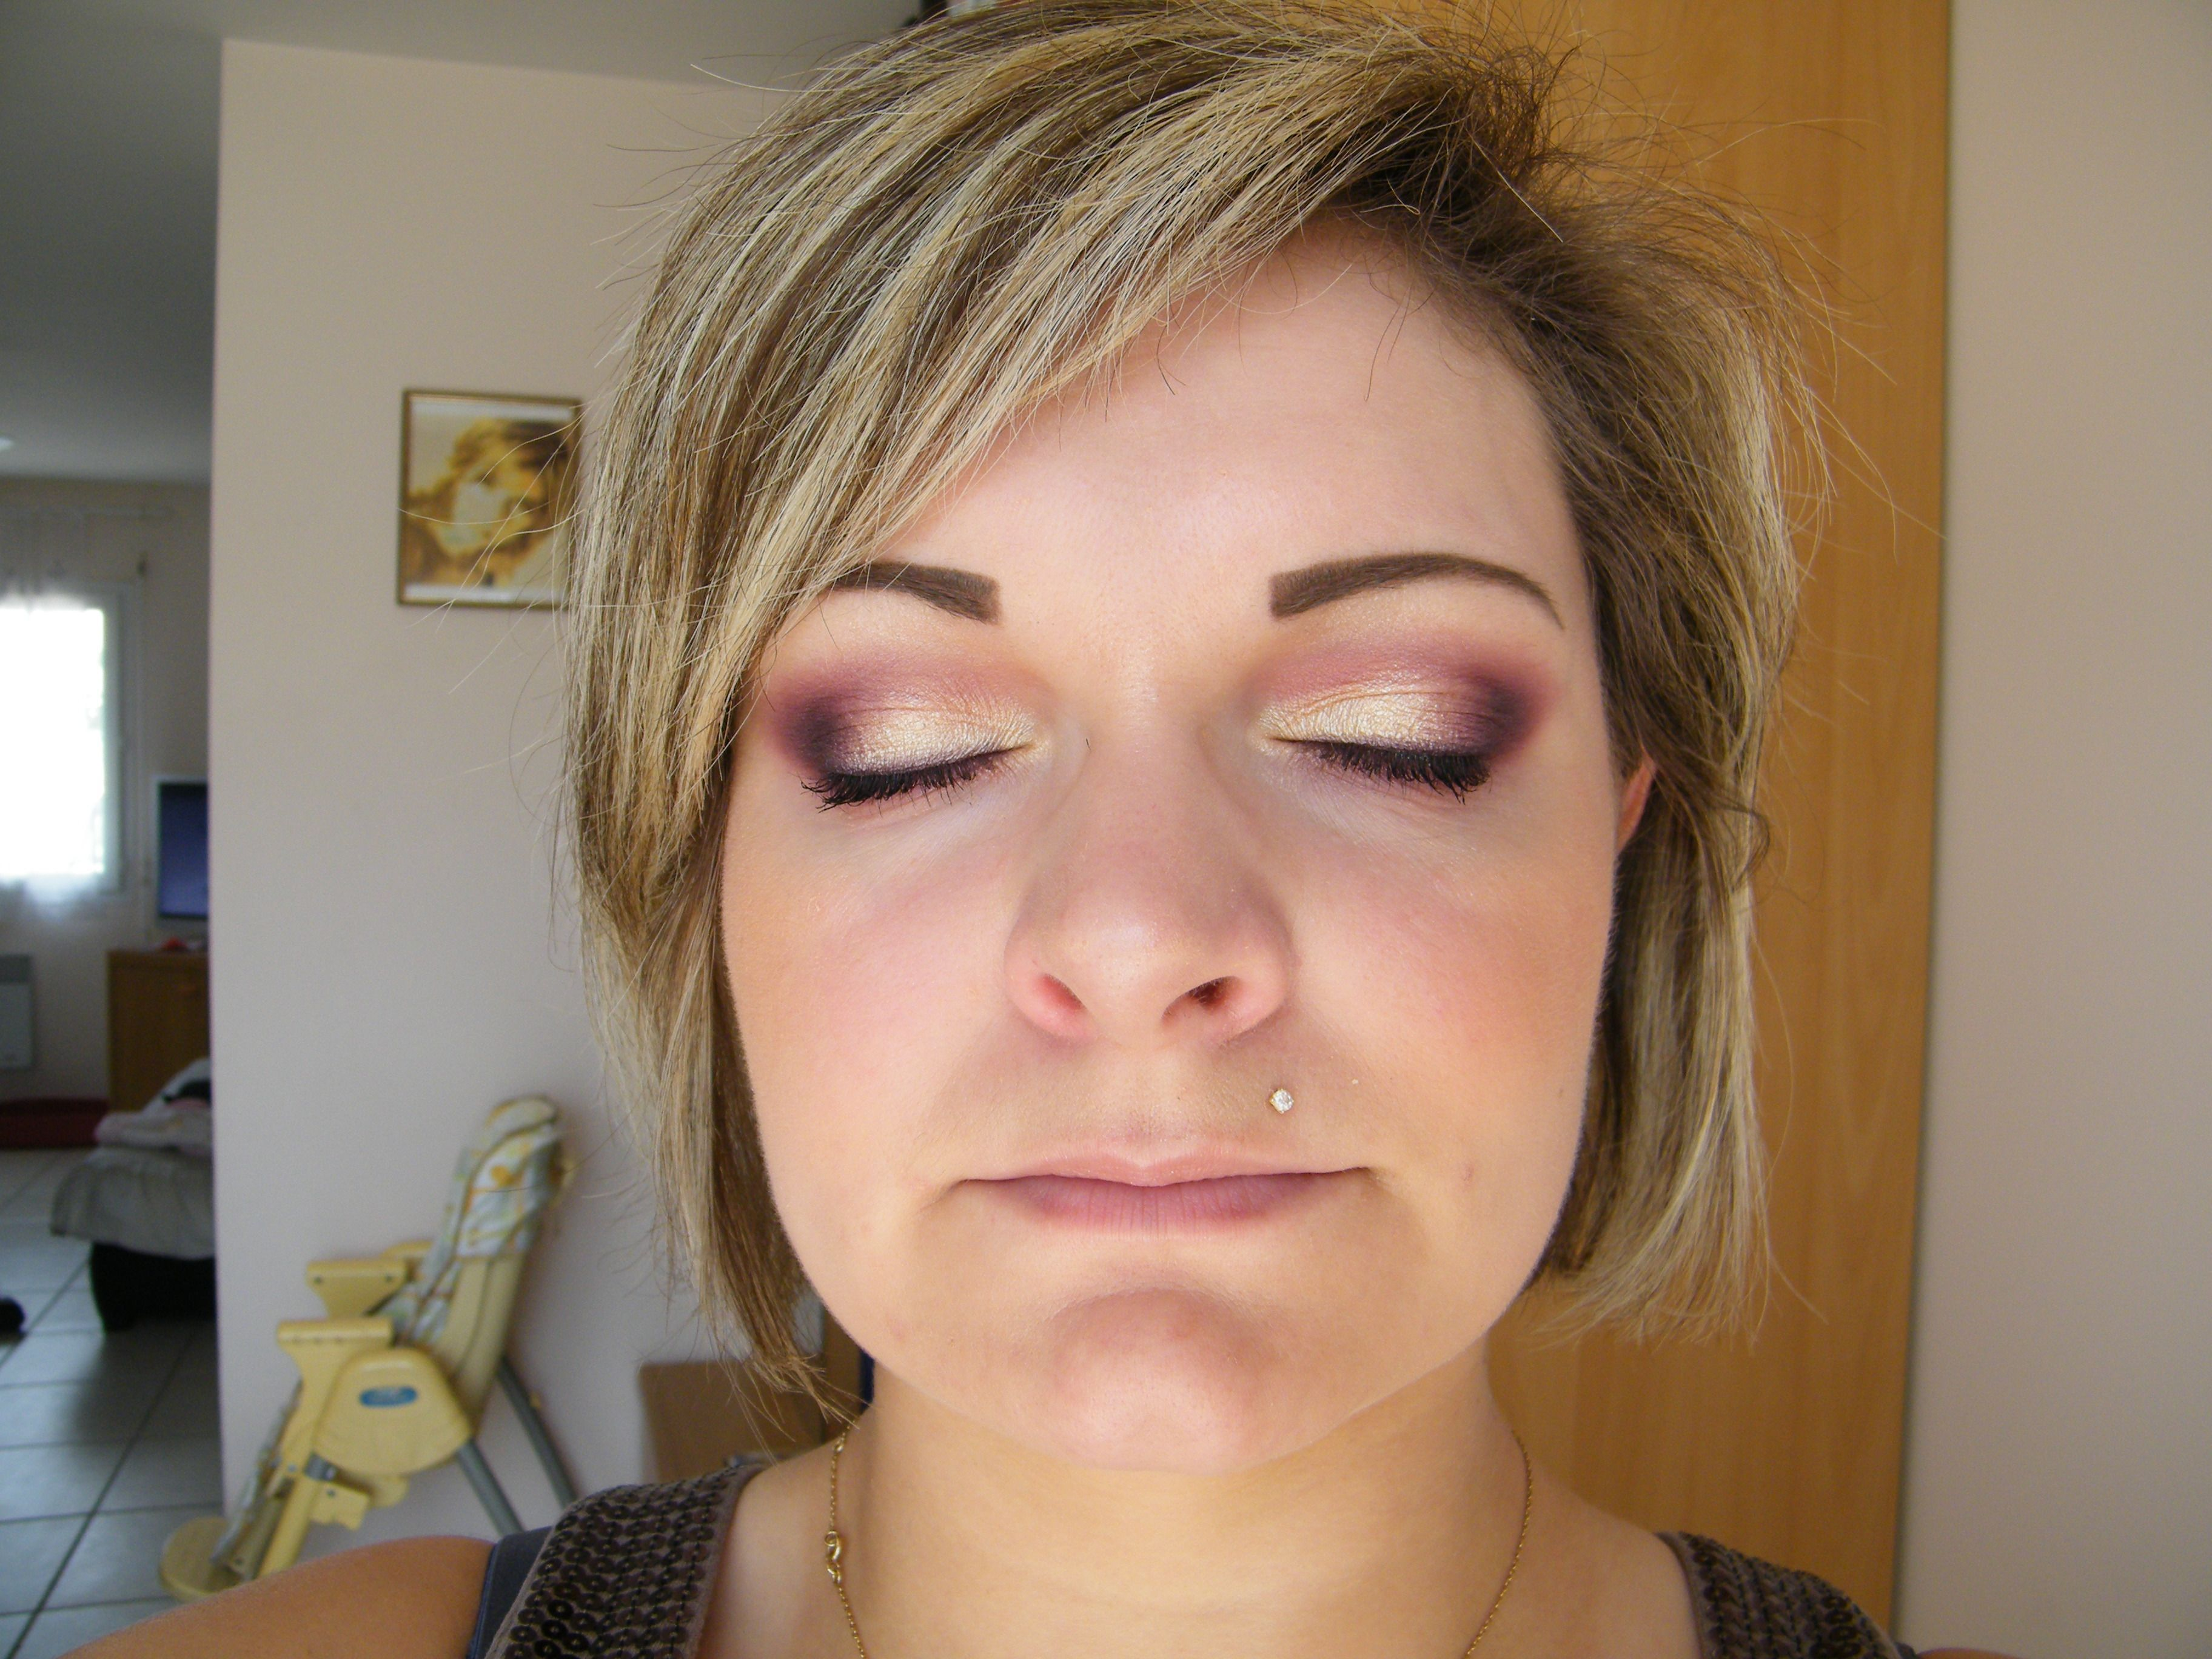 Maquillage nude, prune et violet